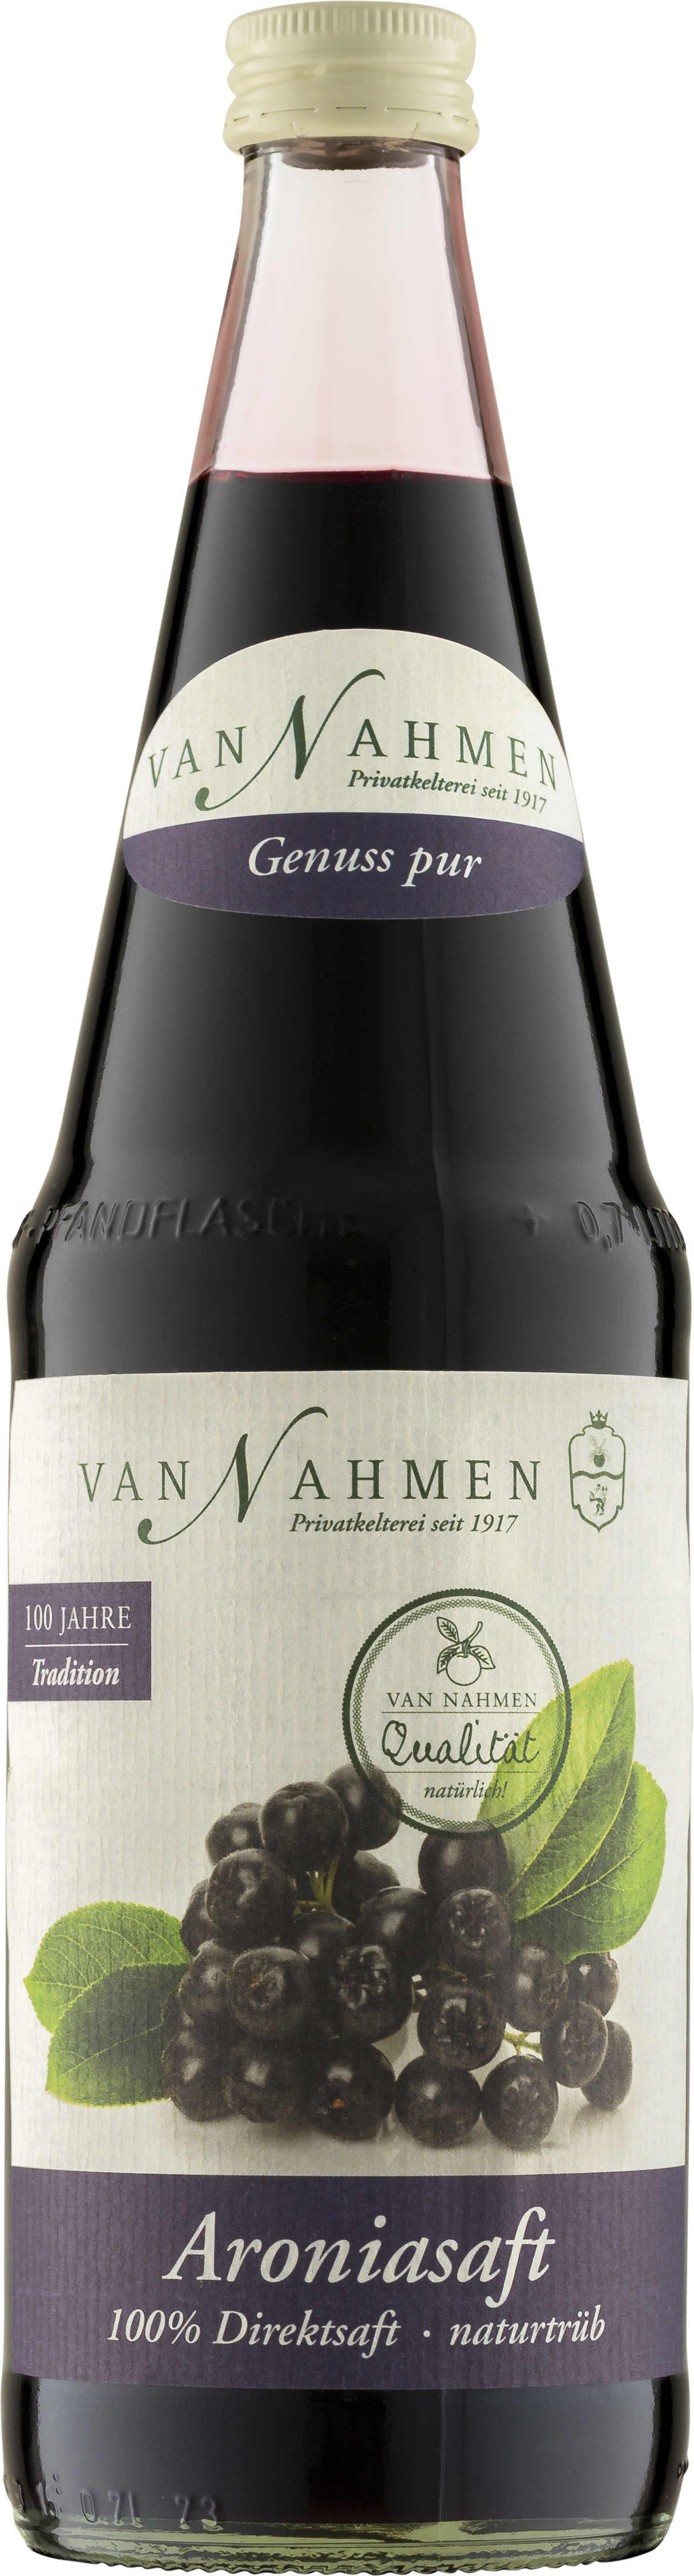 Van Nahmen Aroniasaft